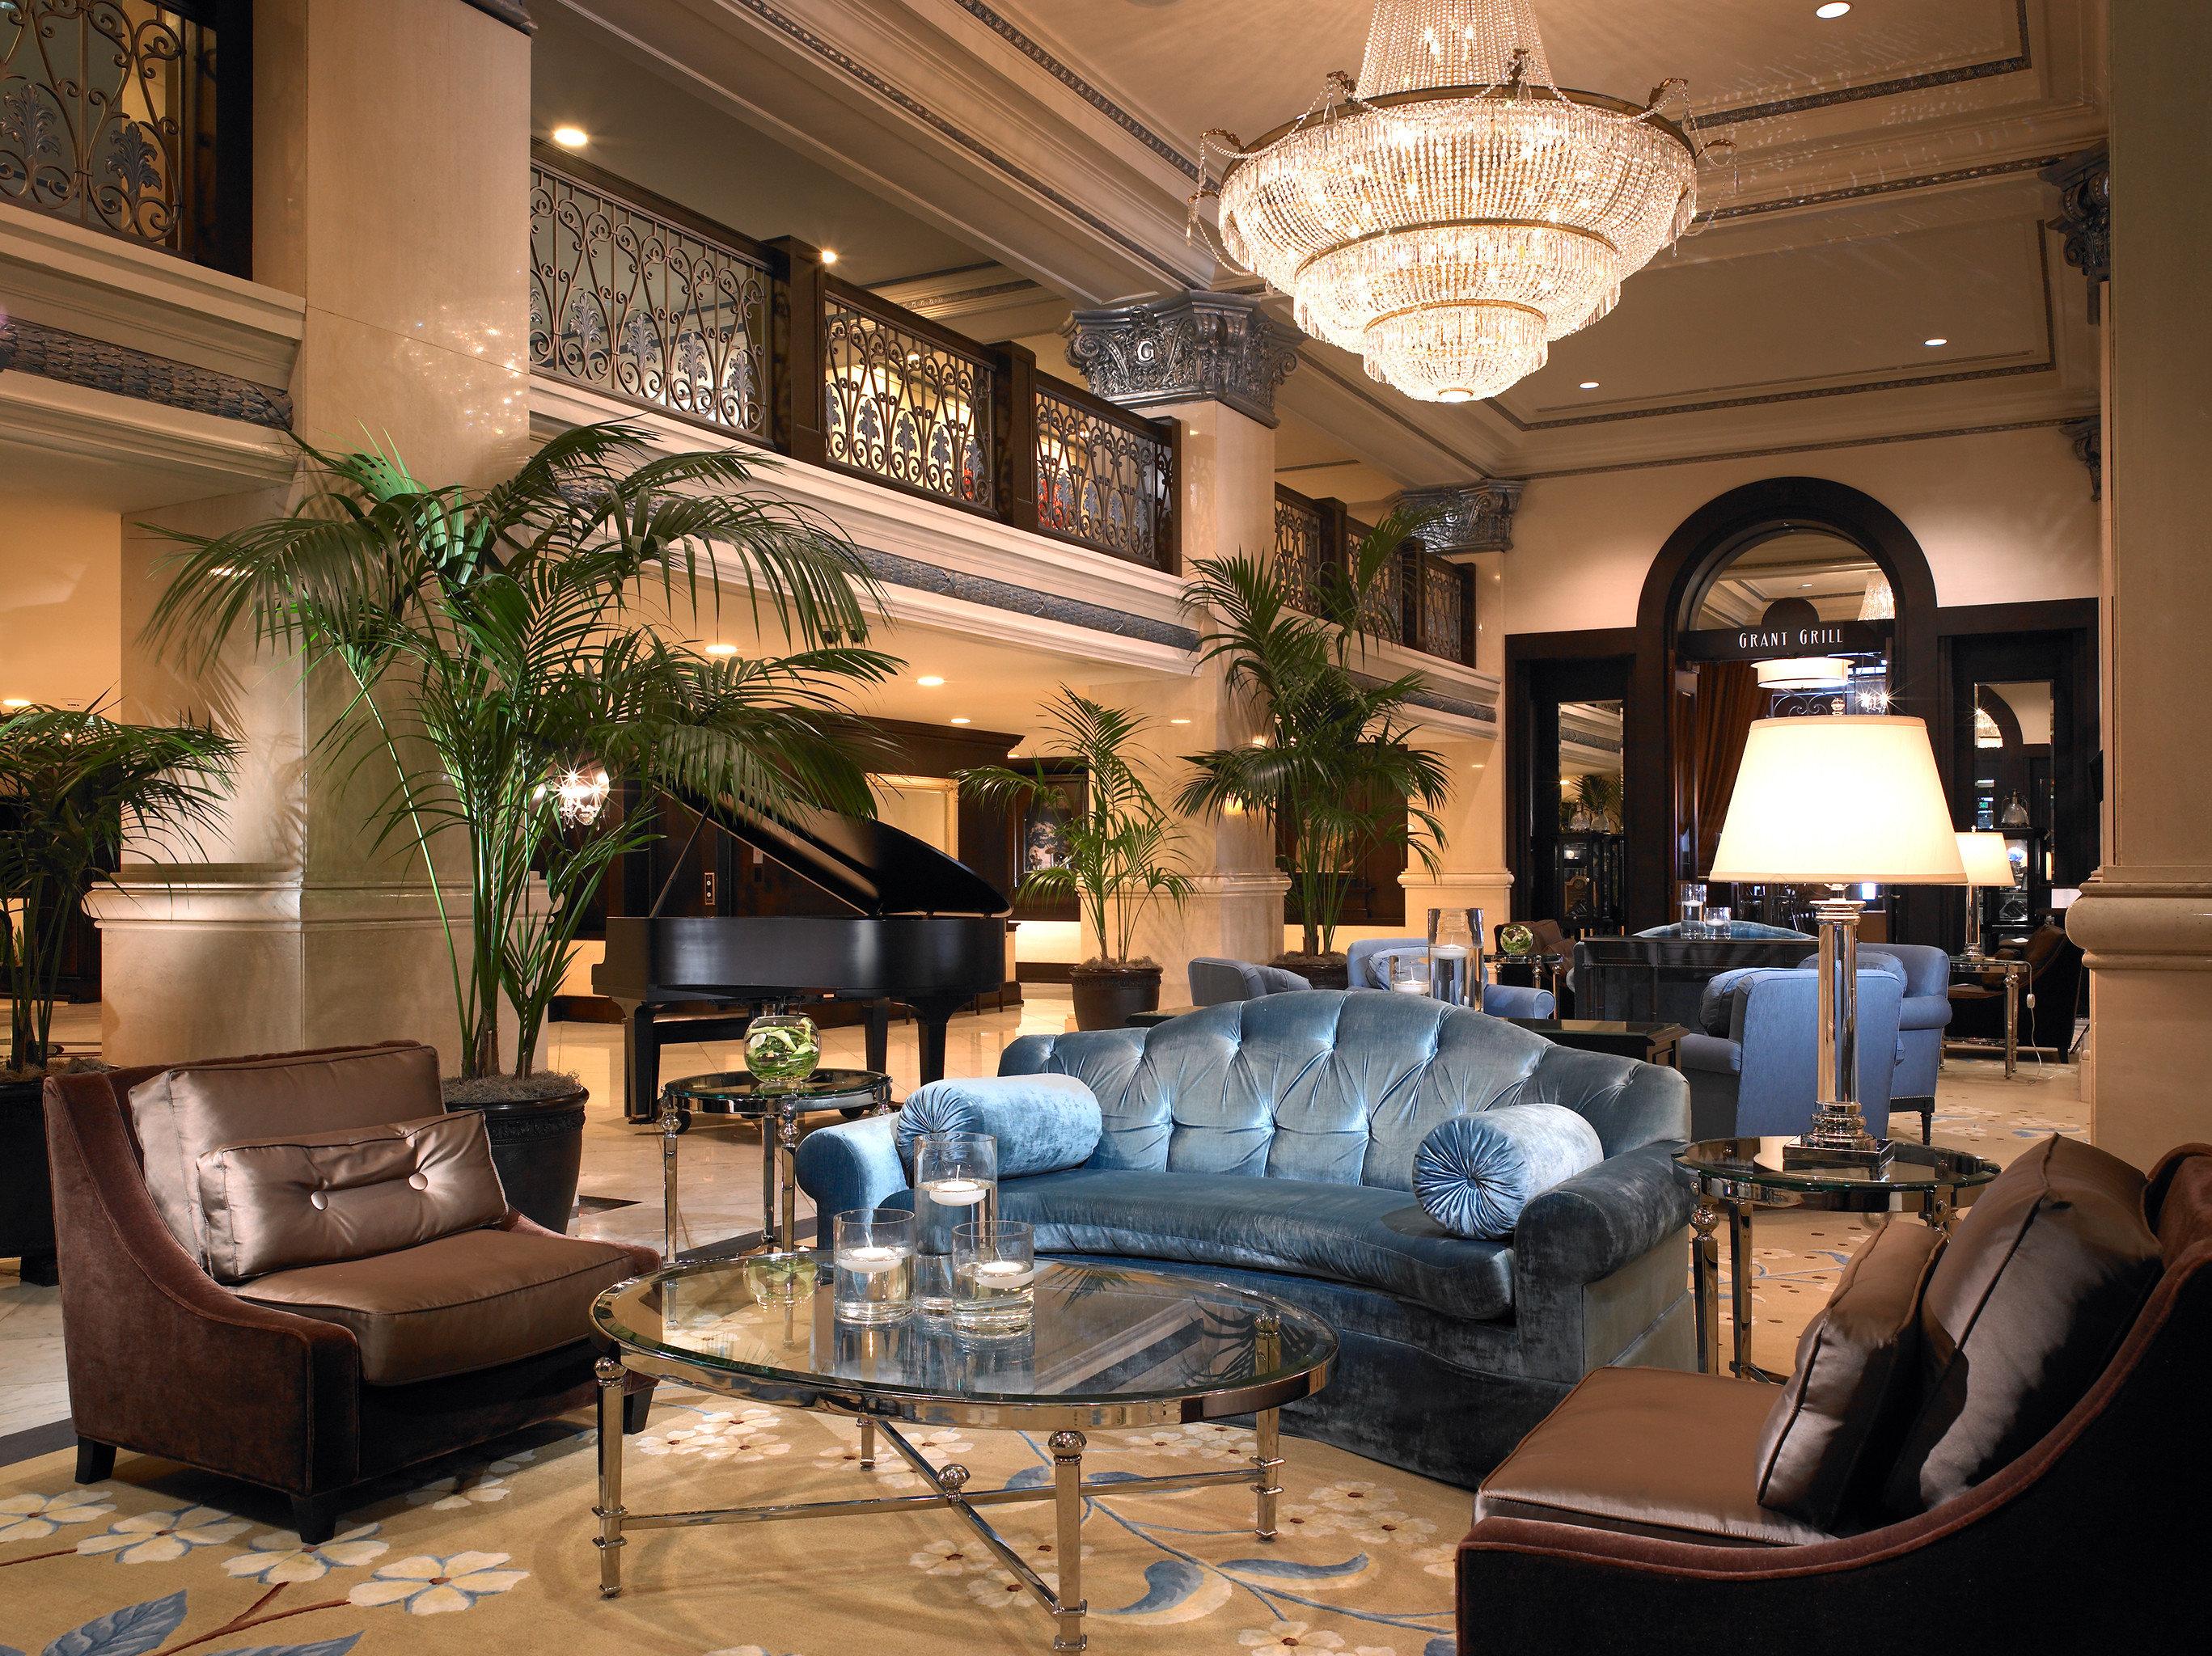 Elegant Hotels Lobby Lounge living room property home mansion Villa cluttered